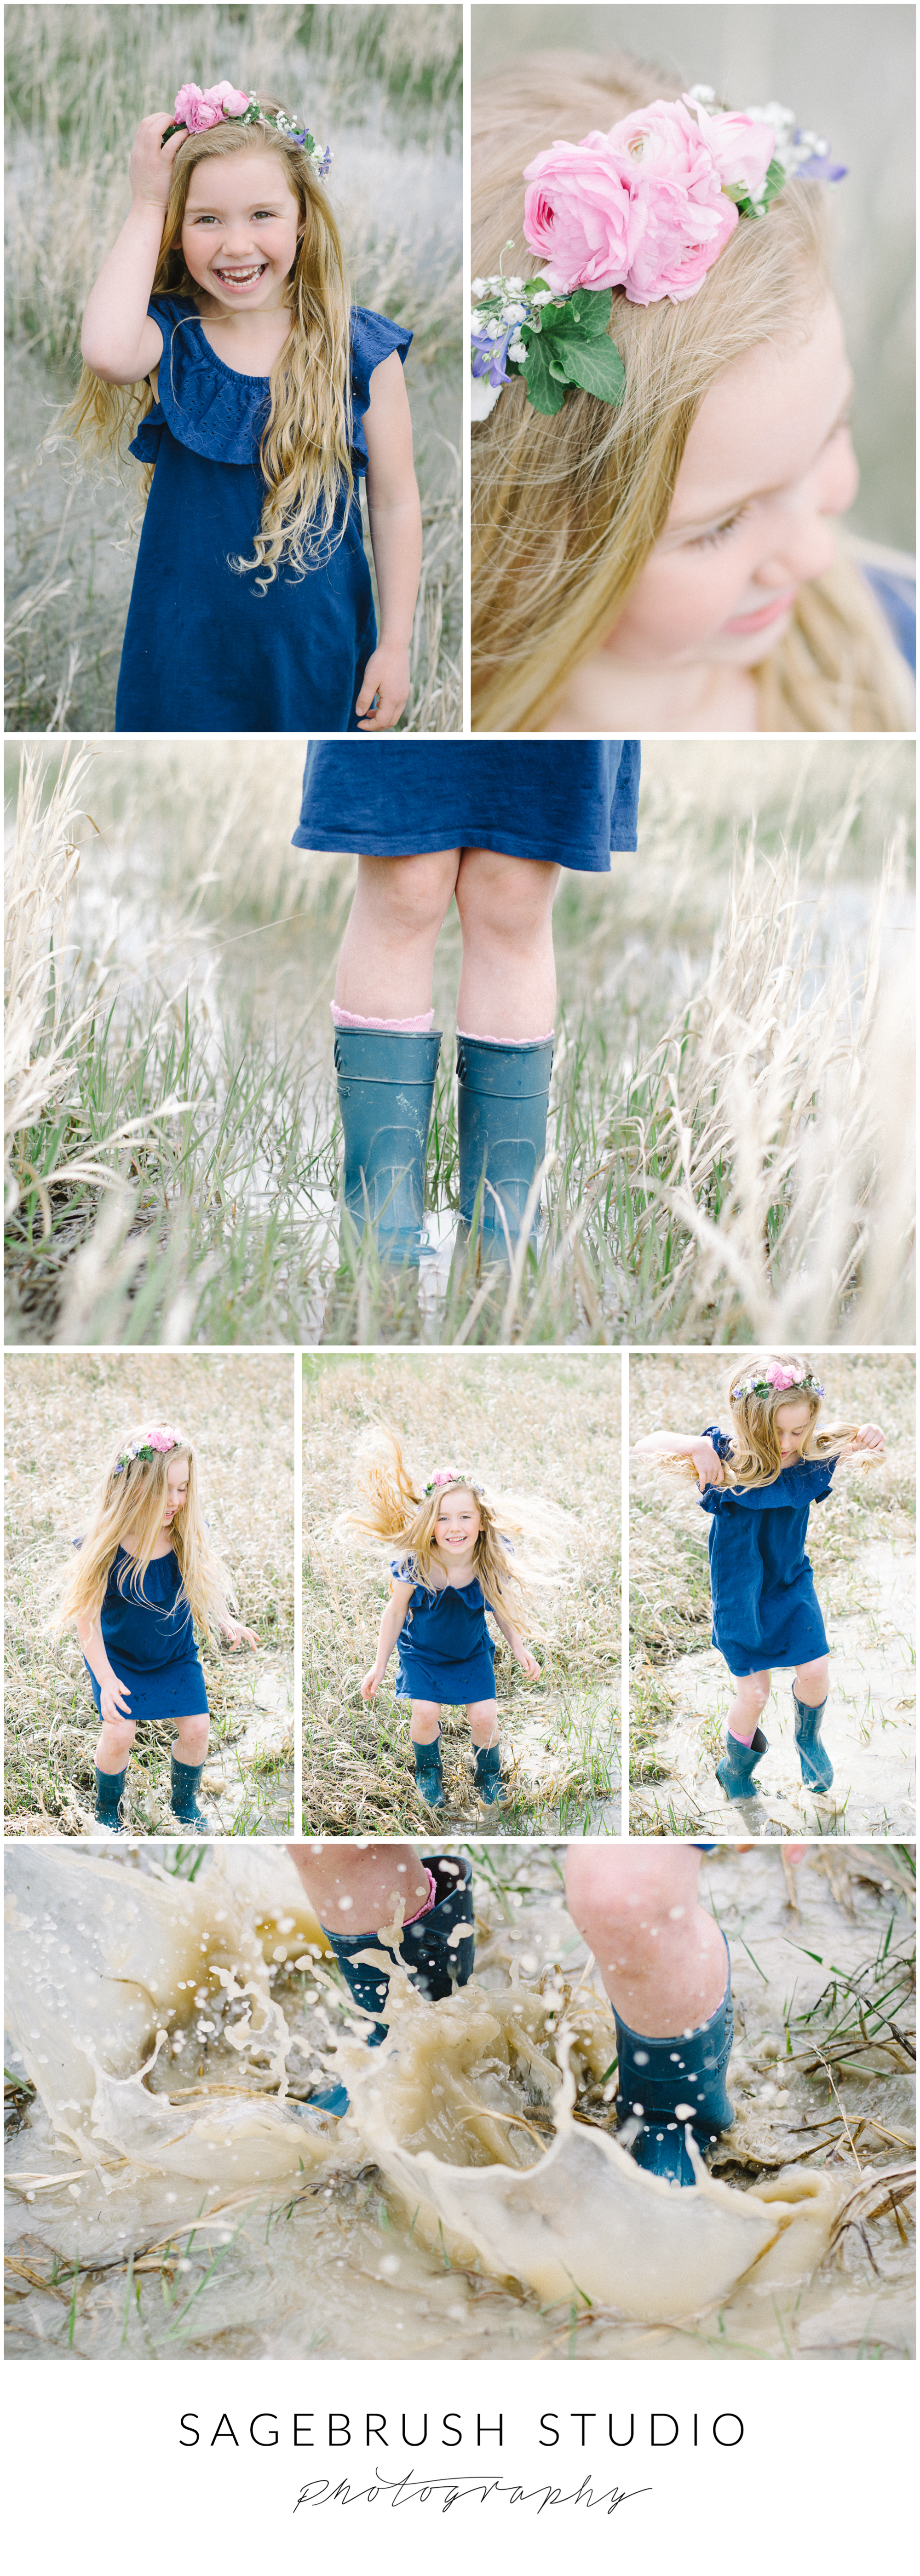 Puddle Princess Sagebrush Studio Photography. Shelby, Montana